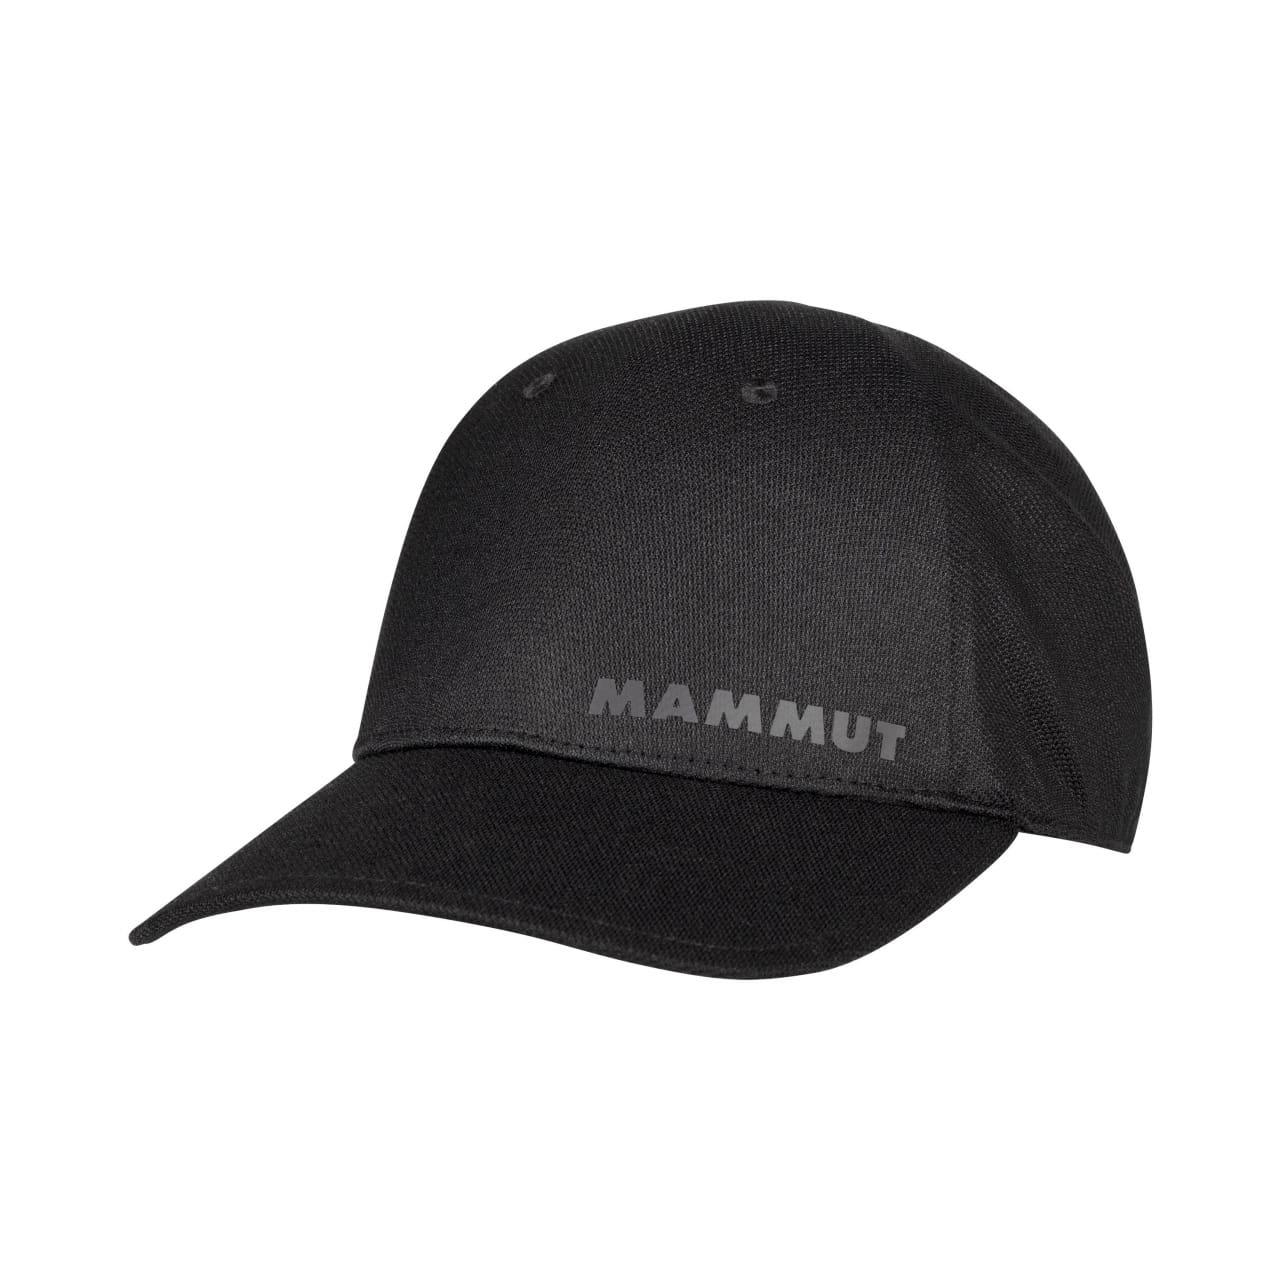 Čepice Mammut Sertig Cap